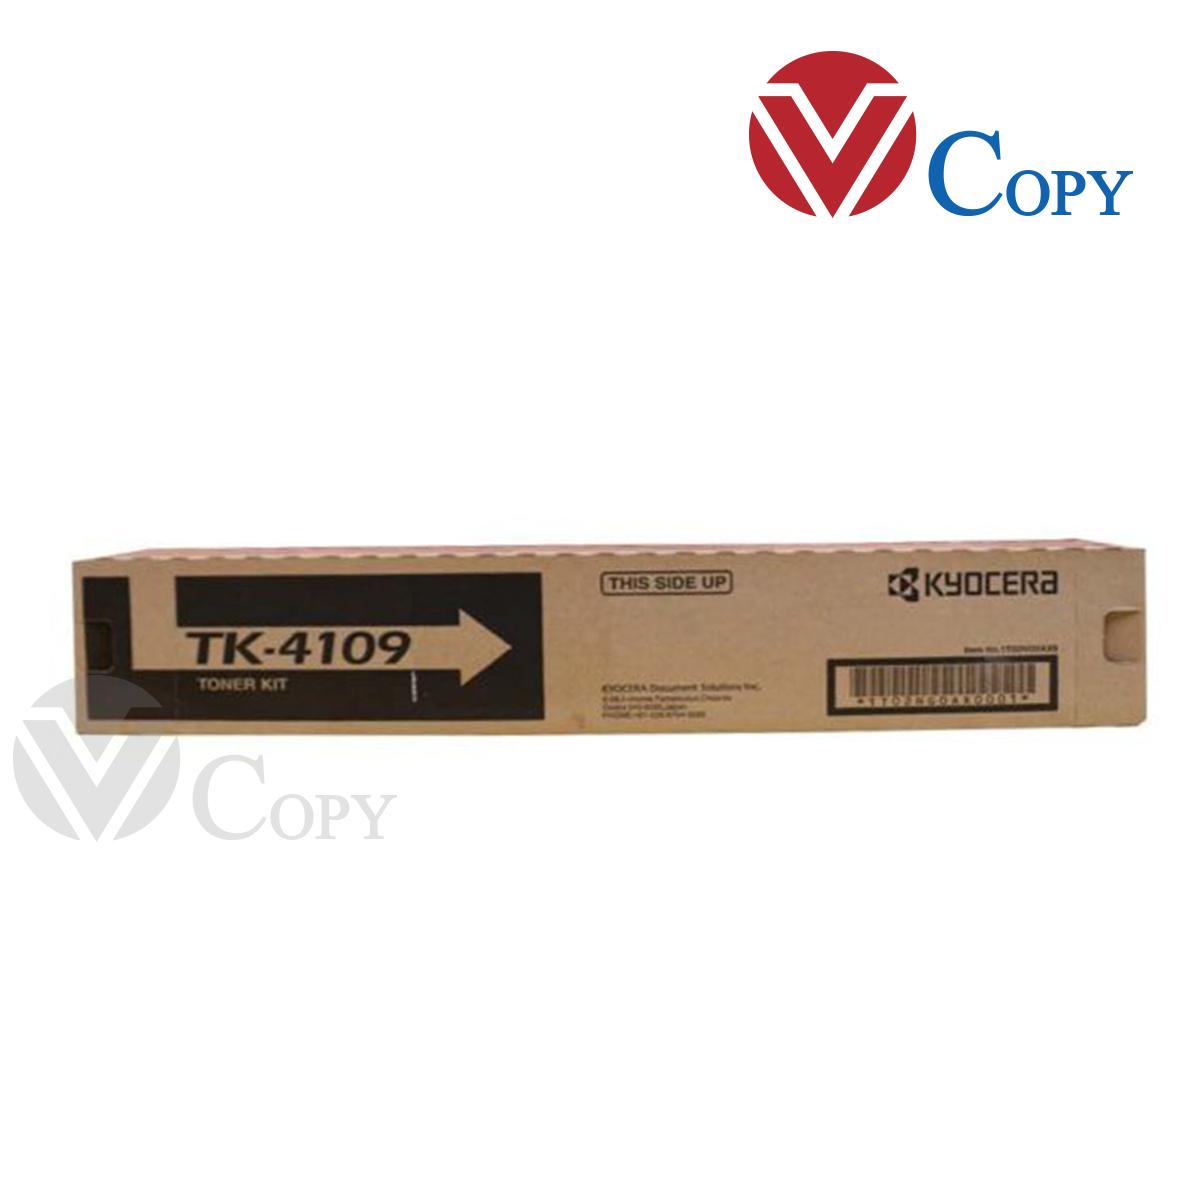 Mực Thương hiệu dùng cho máy Photocopy Kyocera TASKalfa 1800/2200/1801/2201- Hộp mực TK 4109 (450g)